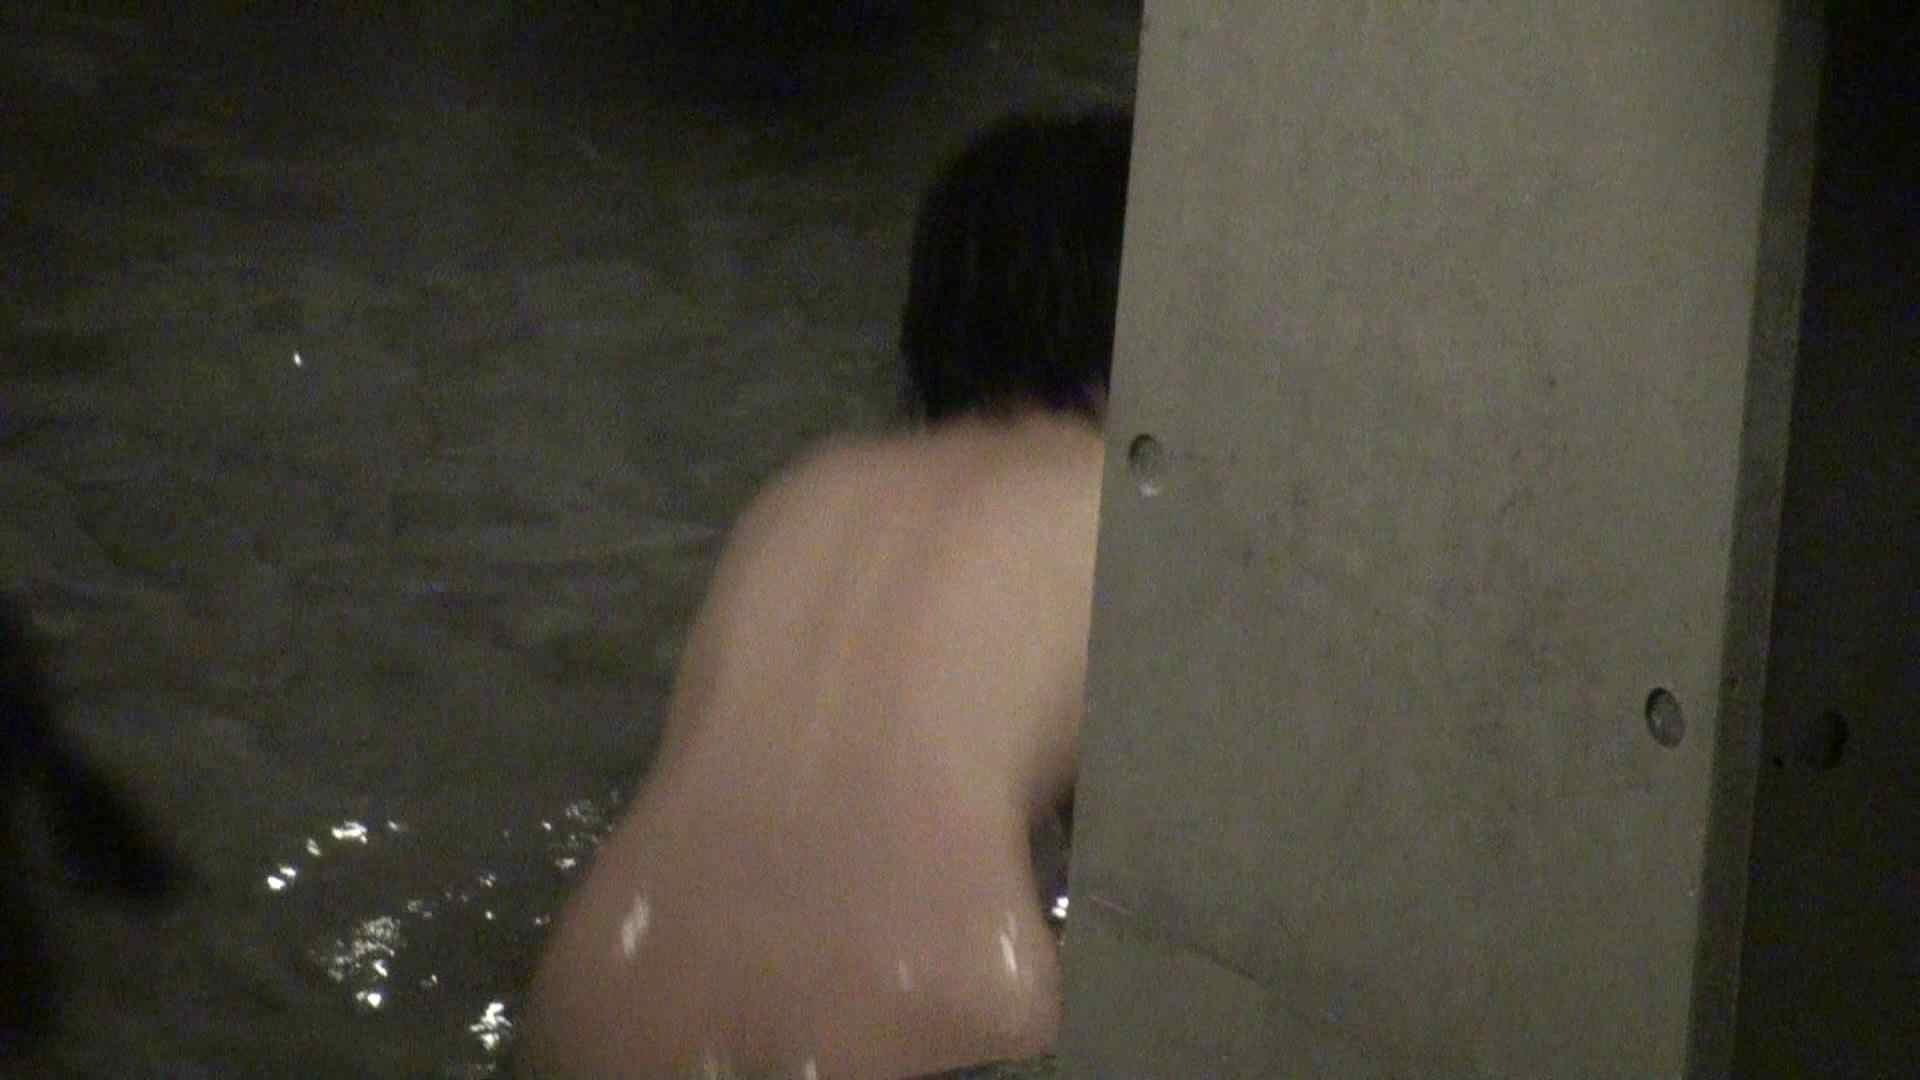 Aquaな露天風呂Vol.323 盗撮大放出 すけべAV動画紹介 69連発 66